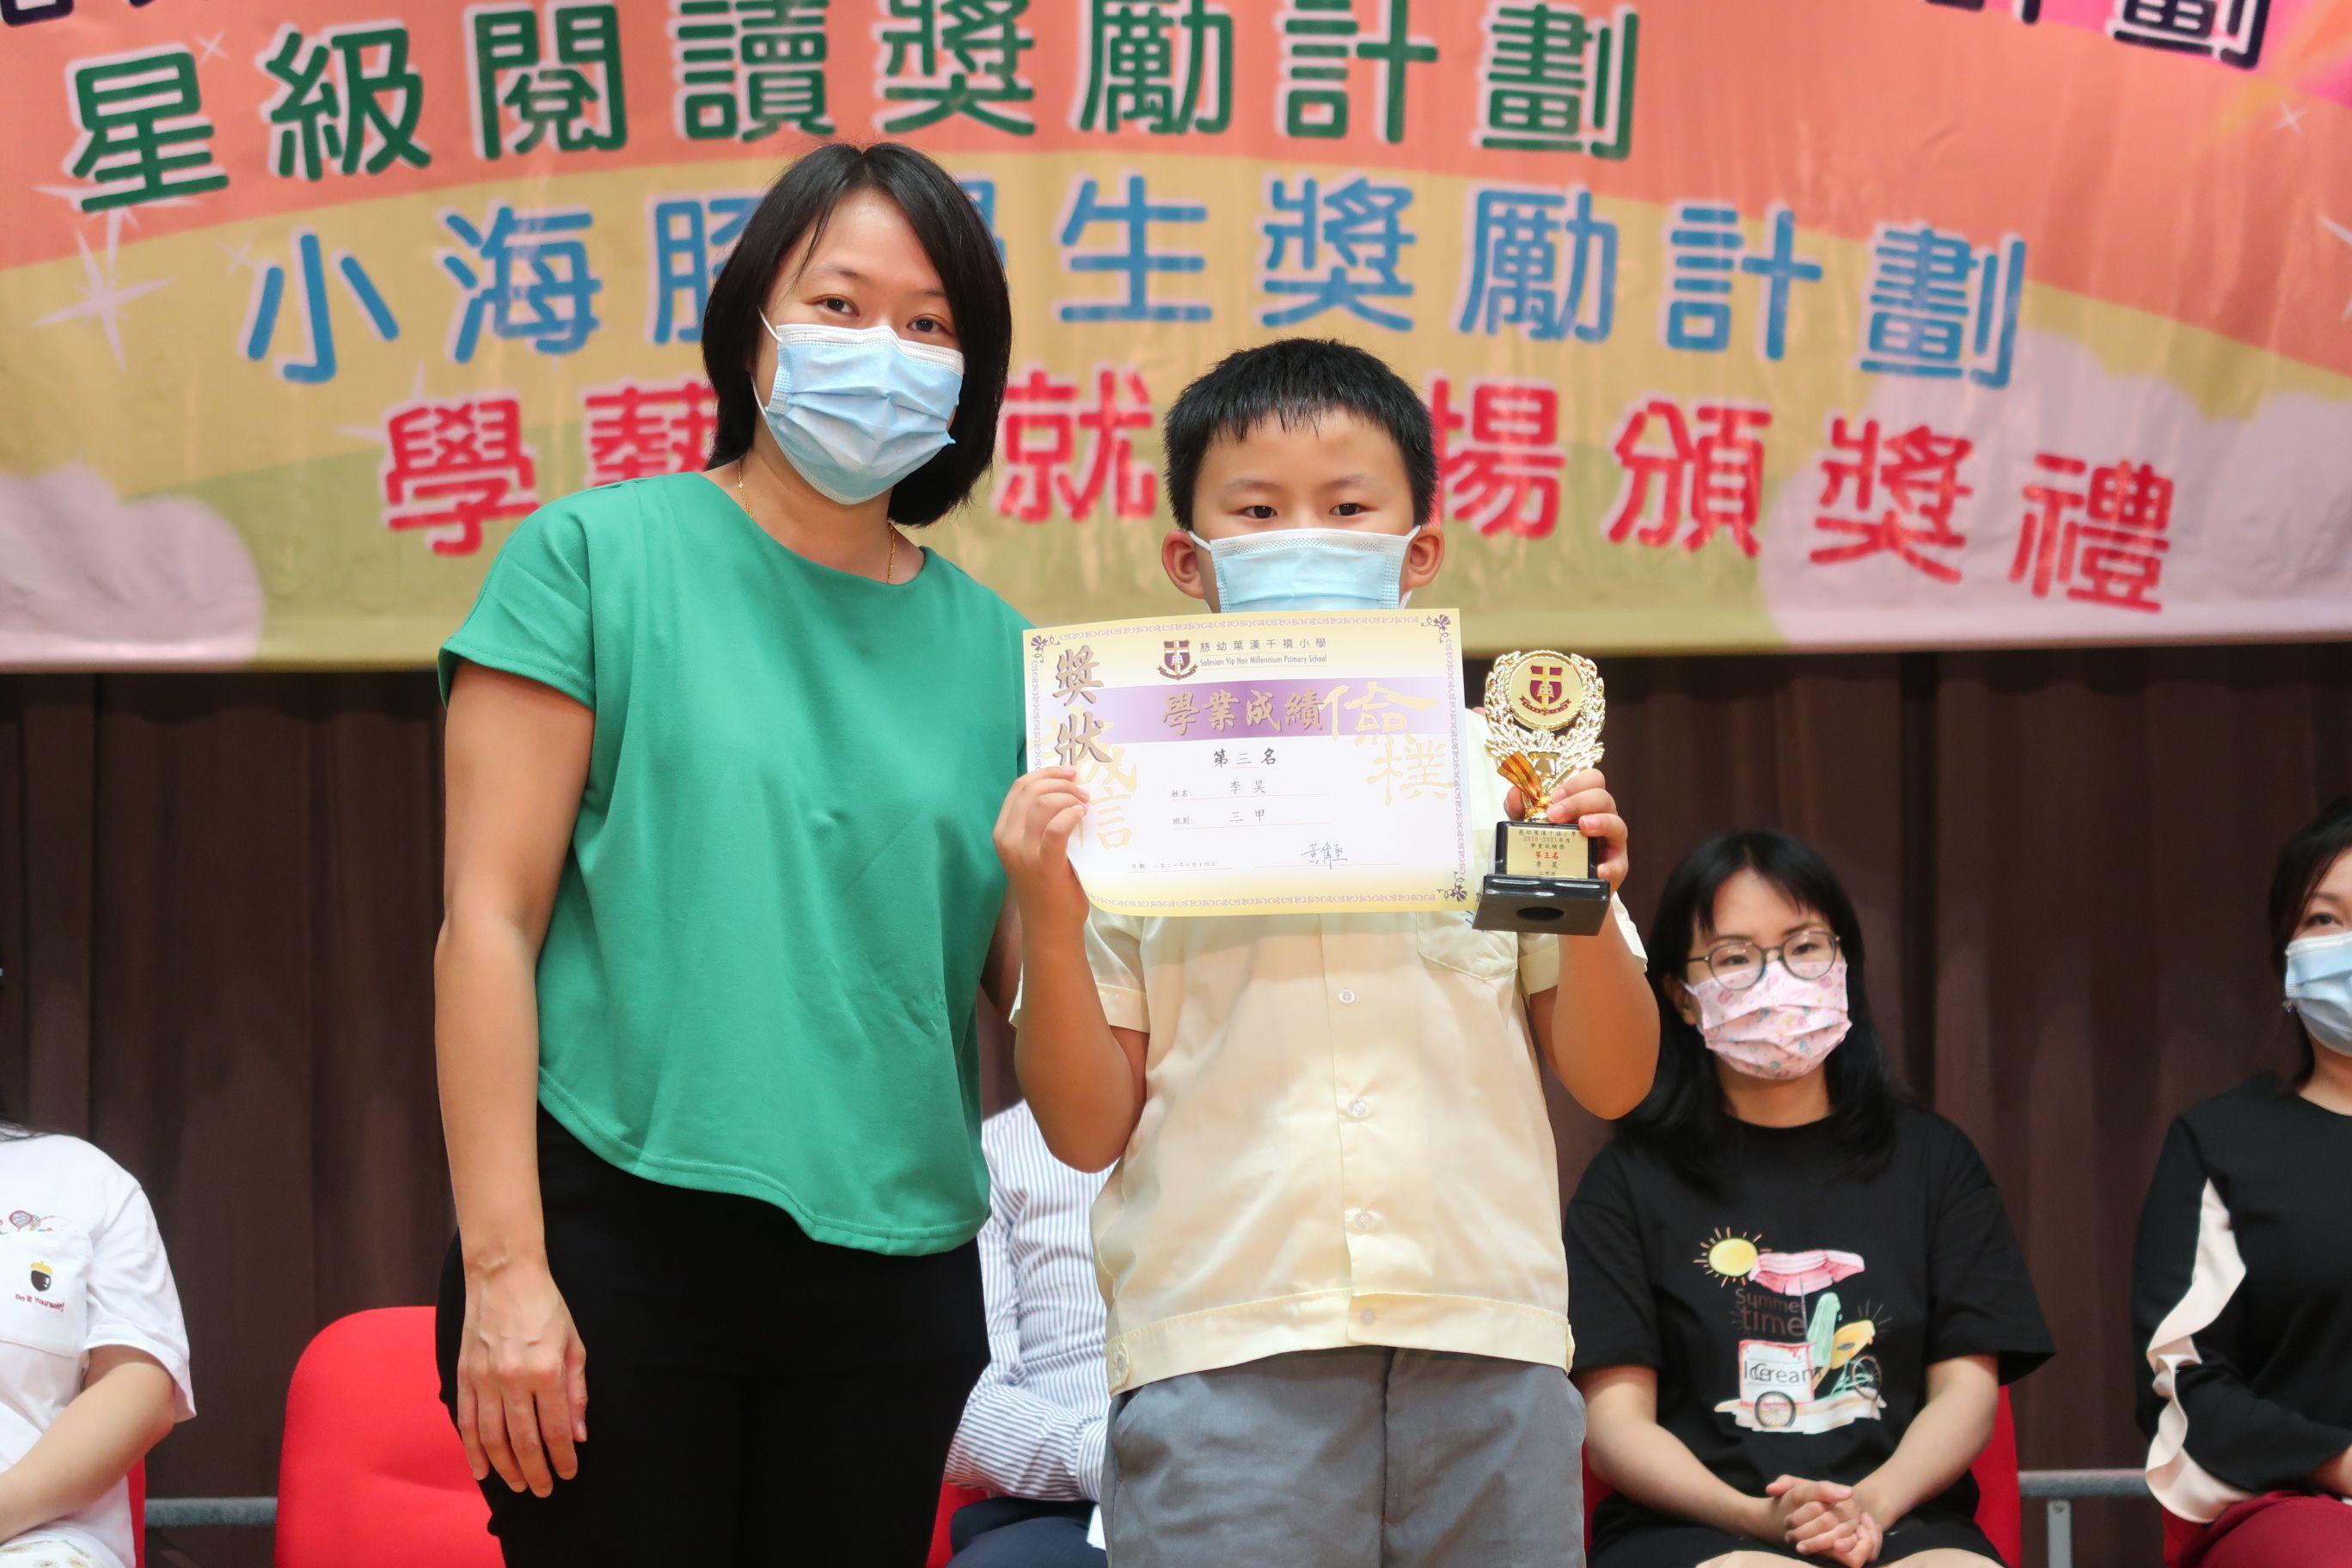 https://syh.edu.hk/sites/default/files/img_5433.jpg